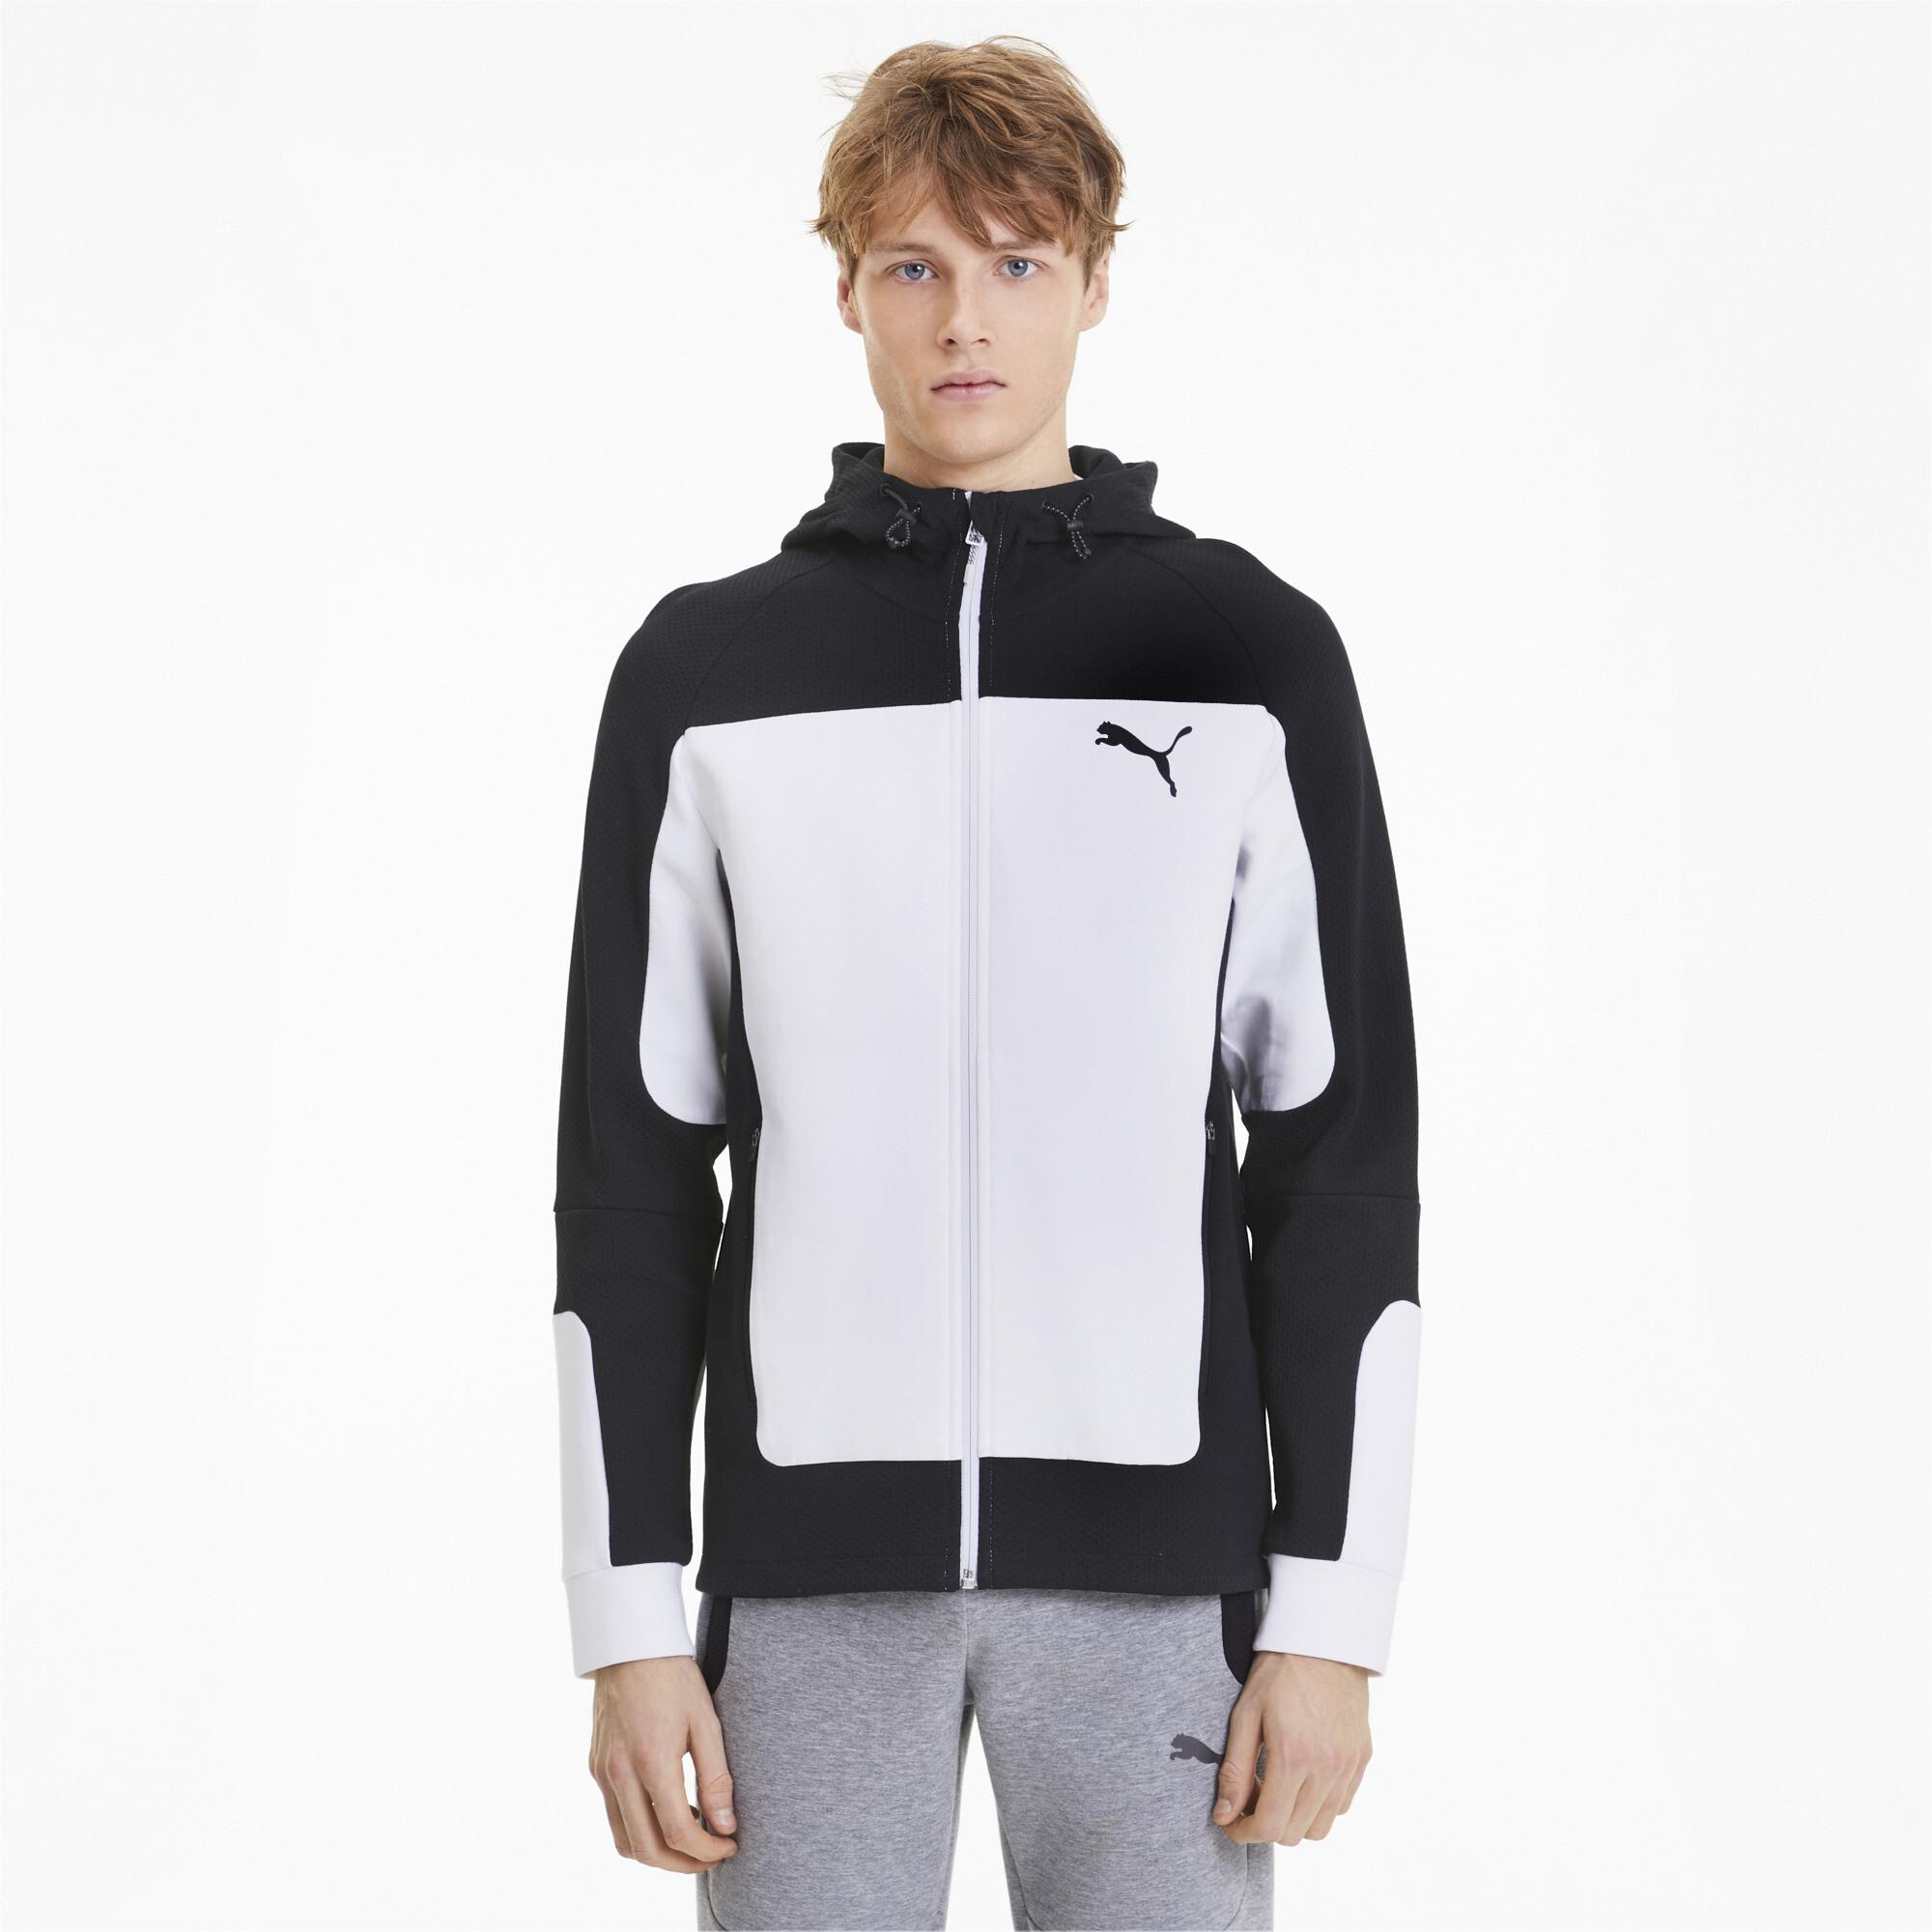 PUMA-Evostripe-Men-039-s-Hooded-Jacket-Men-Sweat-Basics thumbnail 9